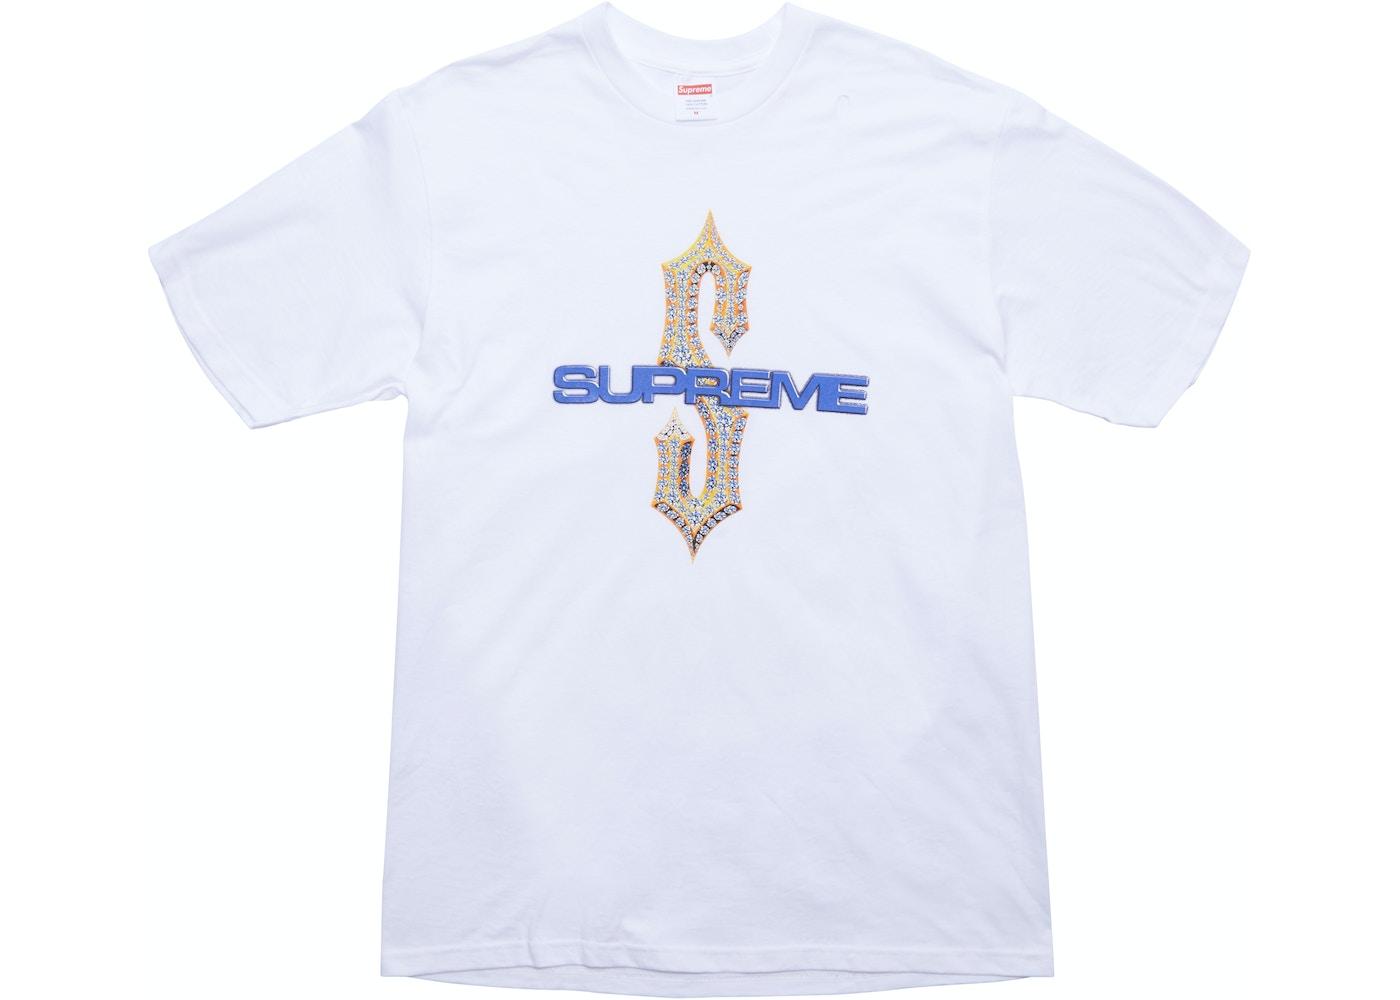 40561165 Streetwear - Supreme T-Shirts - New Highest Bids